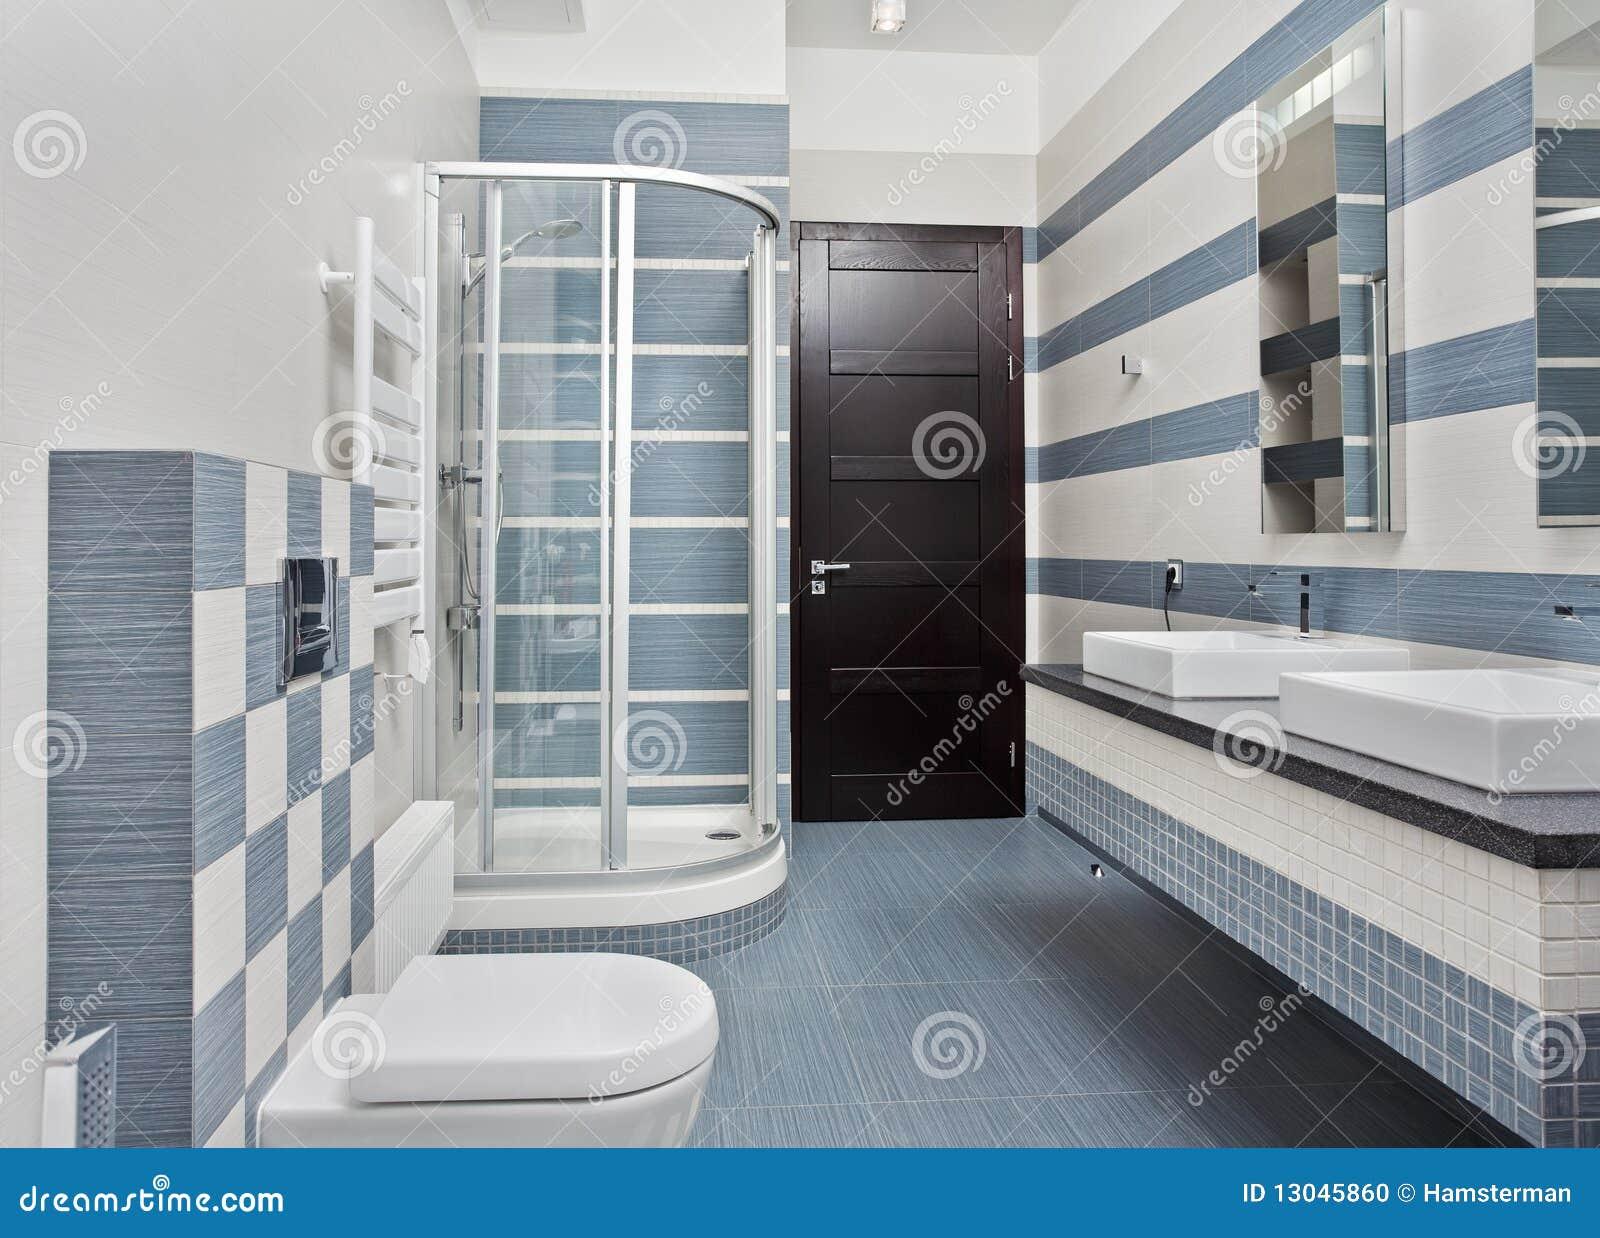 Salle De Bain Avec Faience Bleu